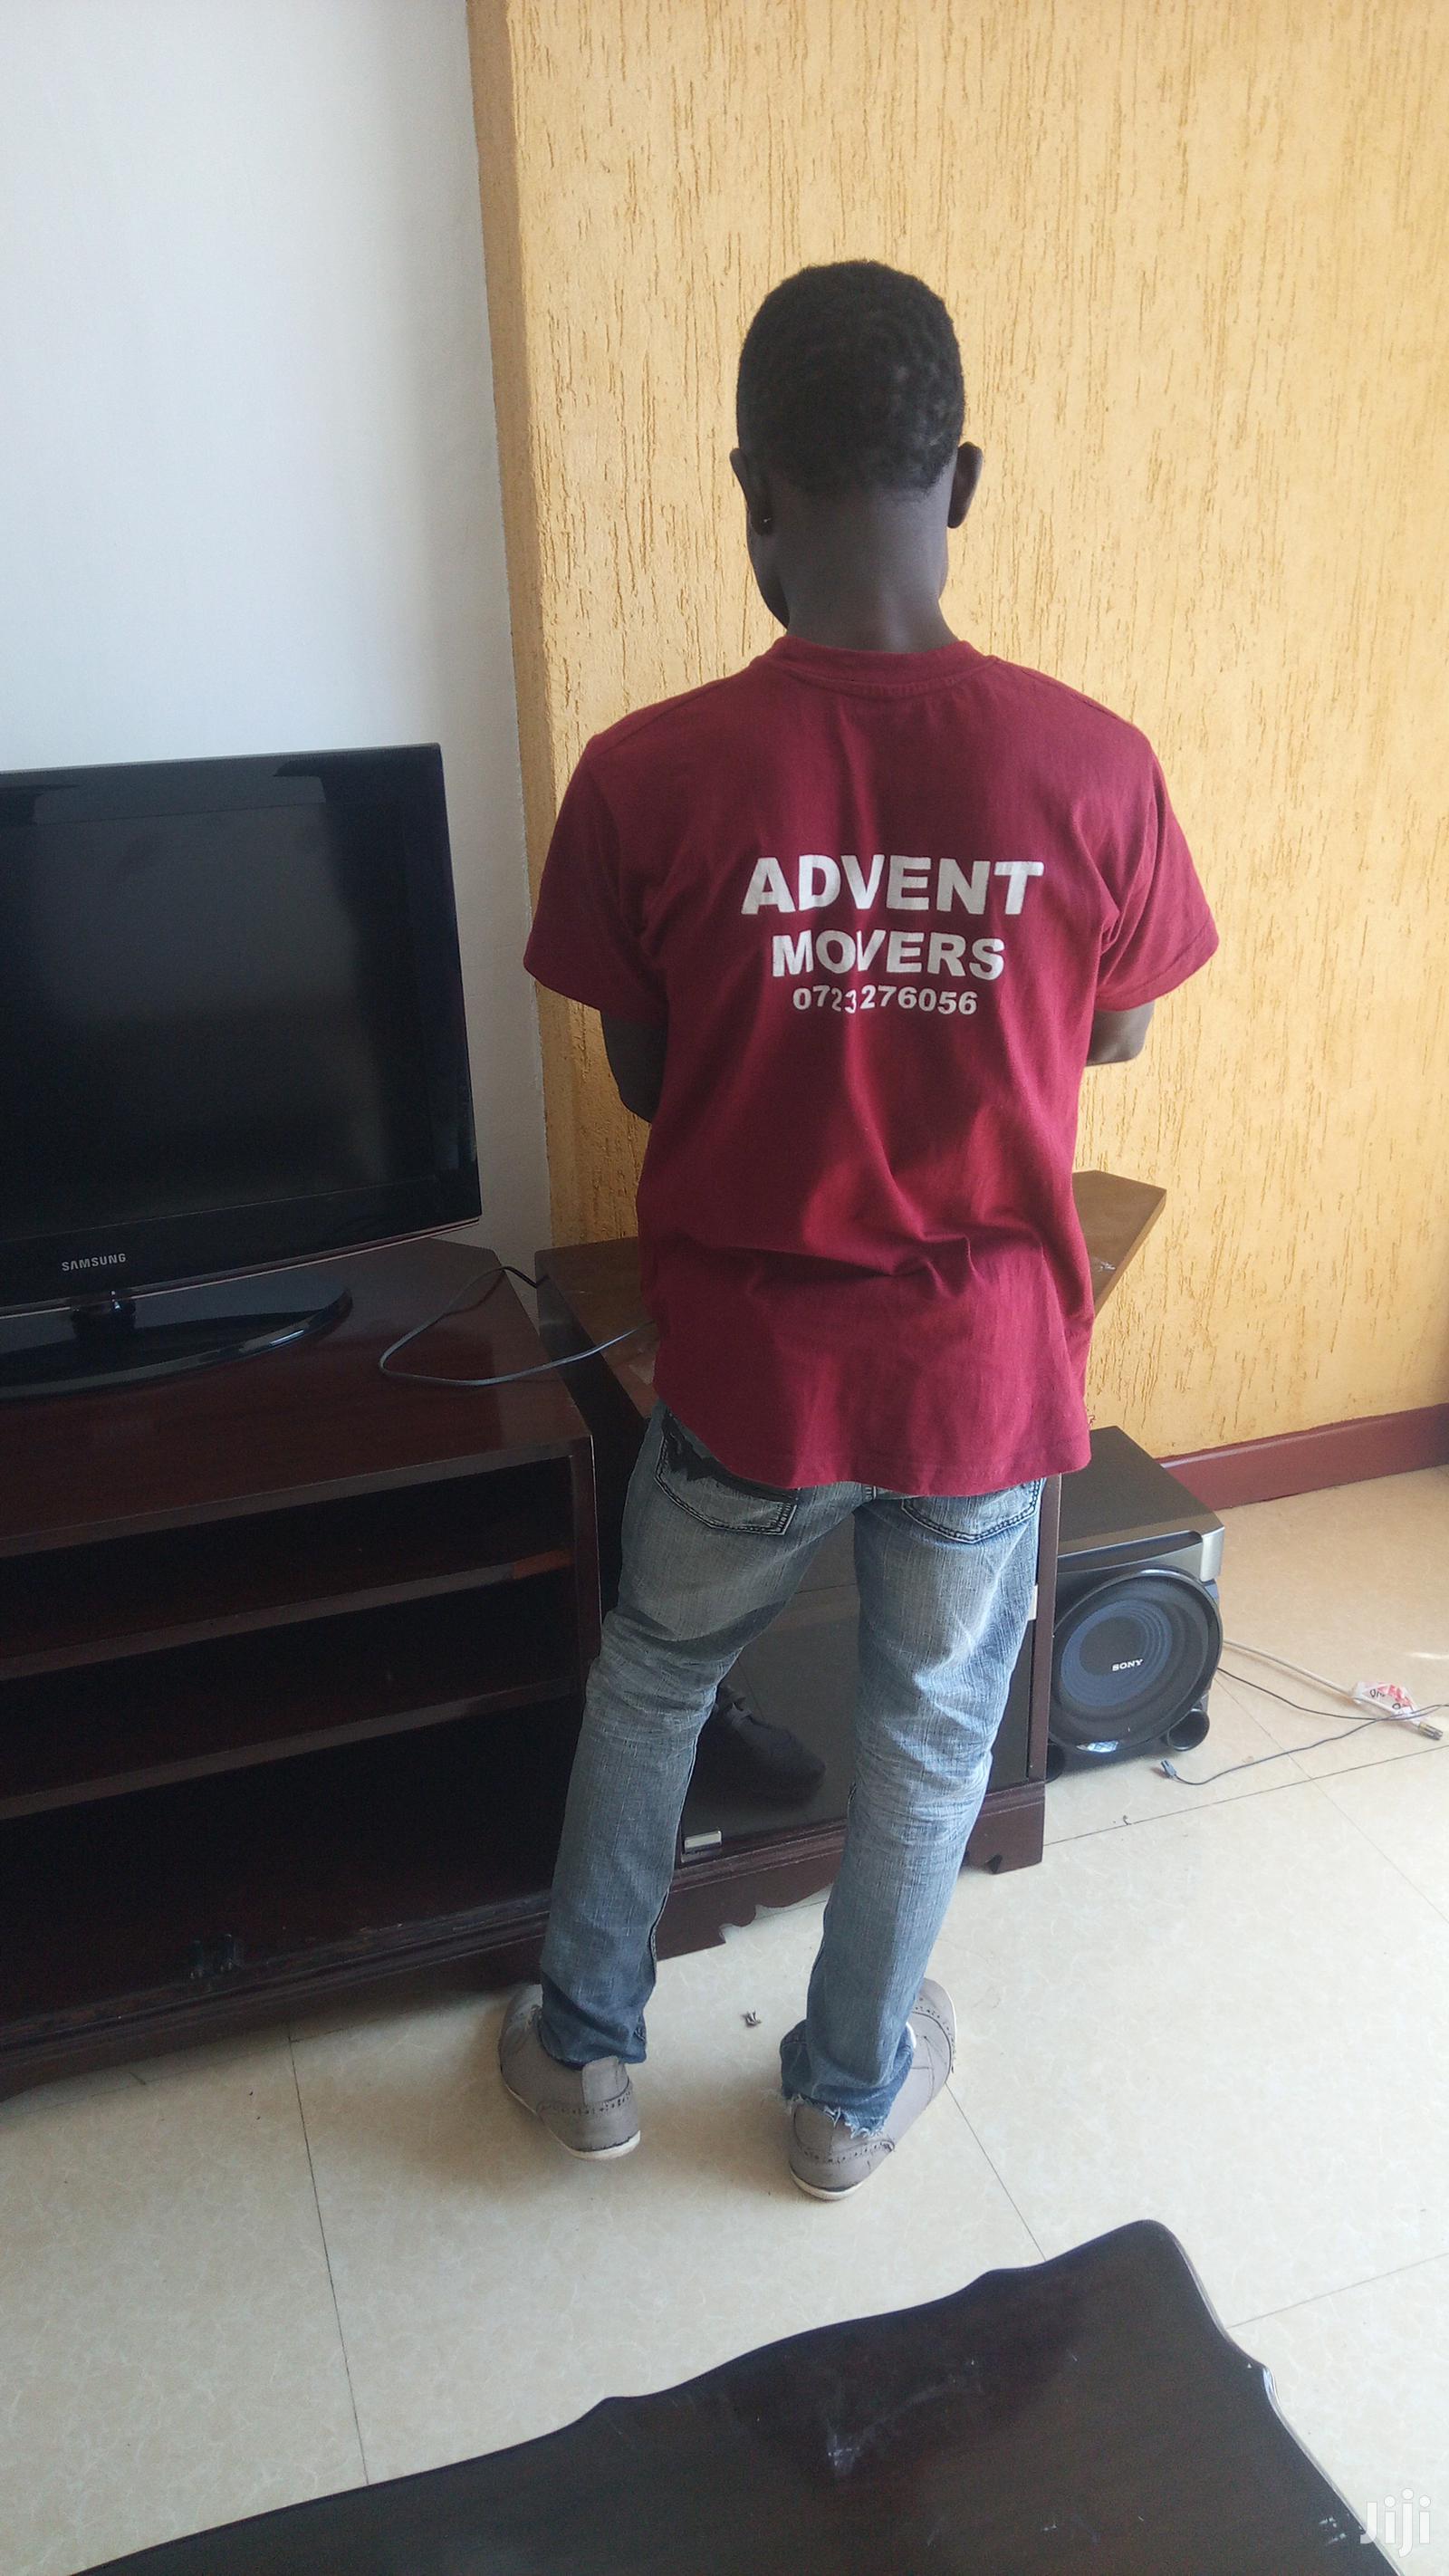 Advent Movers | Logistics Services for sale in Kamulu/Joska (Kasarani), Nairobi, Kenya